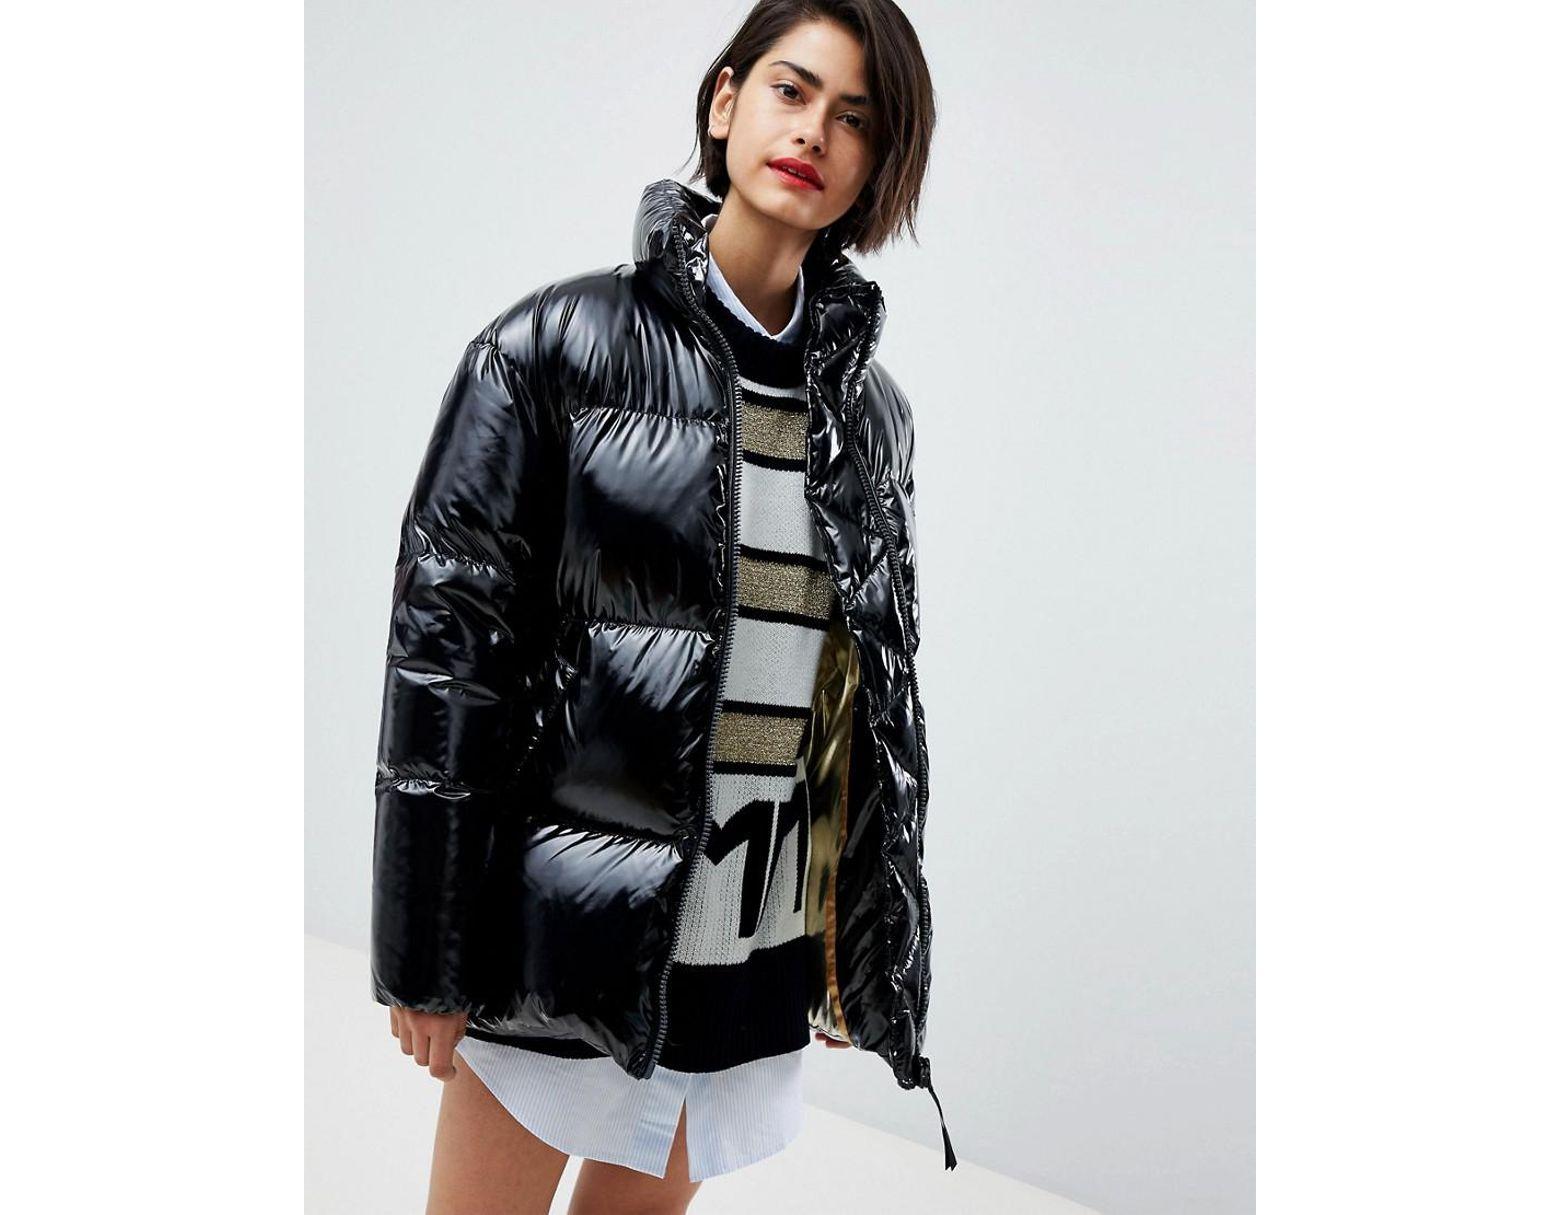 a65dbc62f5cb Tommy Hilfiger Icon High Shine Padded Jacket in Black - Lyst